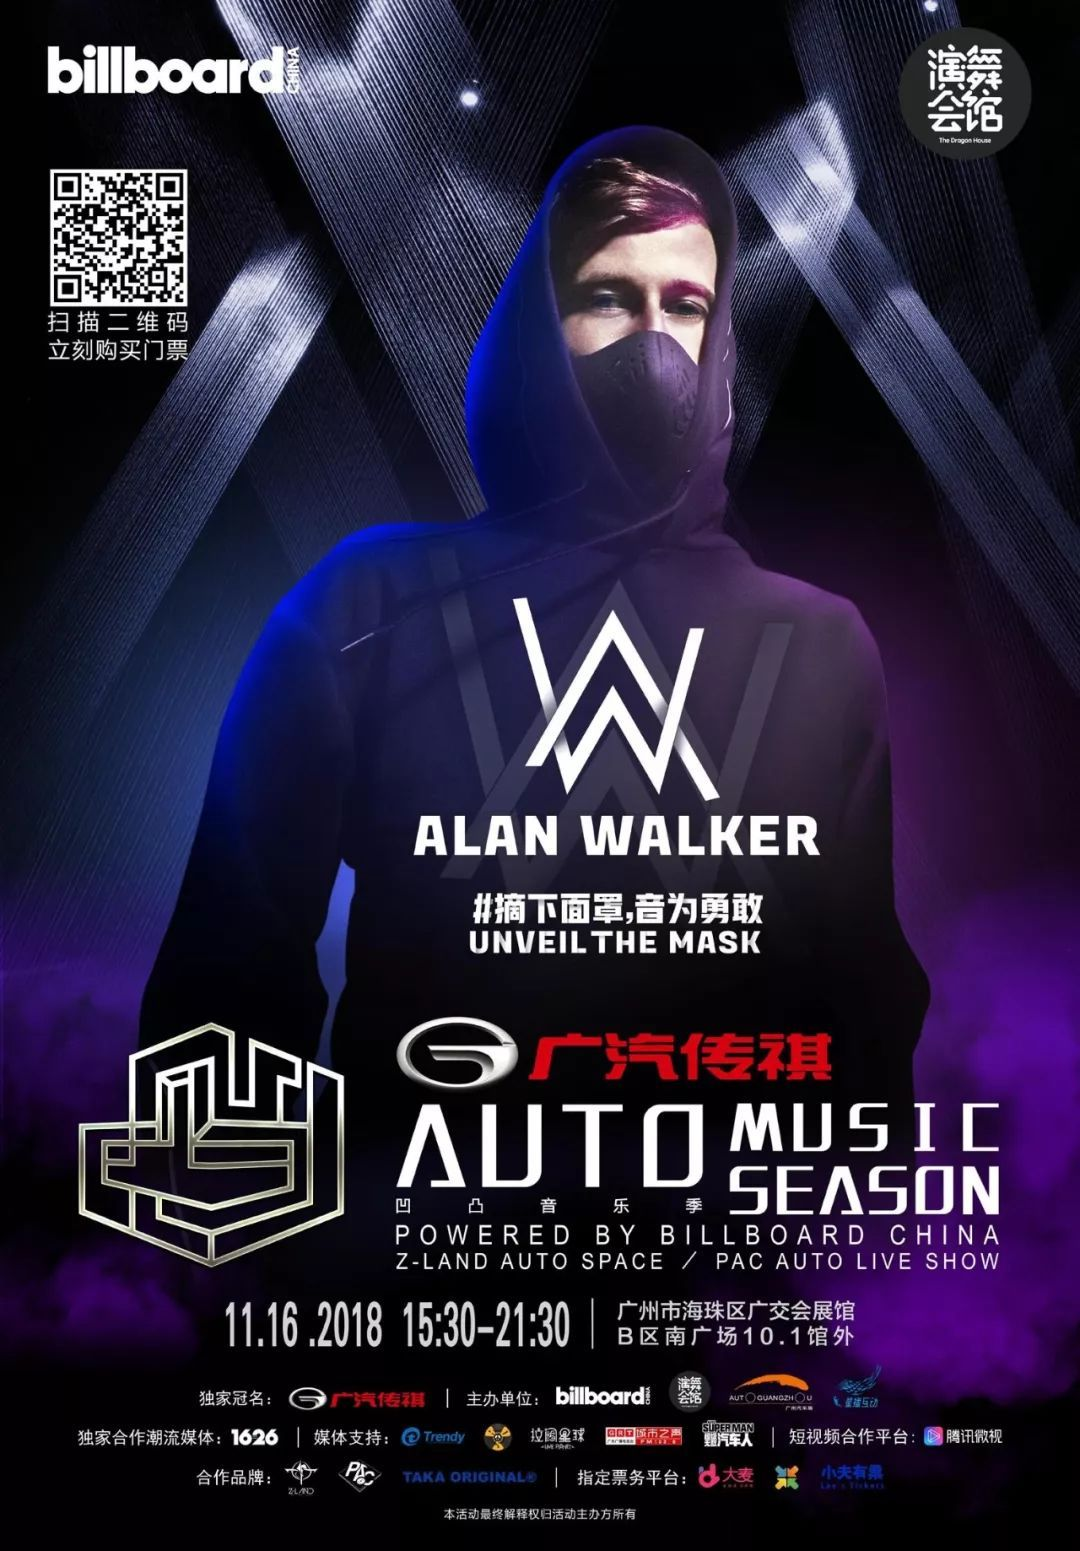 AlanWalker_HOPE-T_单曲在线试听_酷我音乐